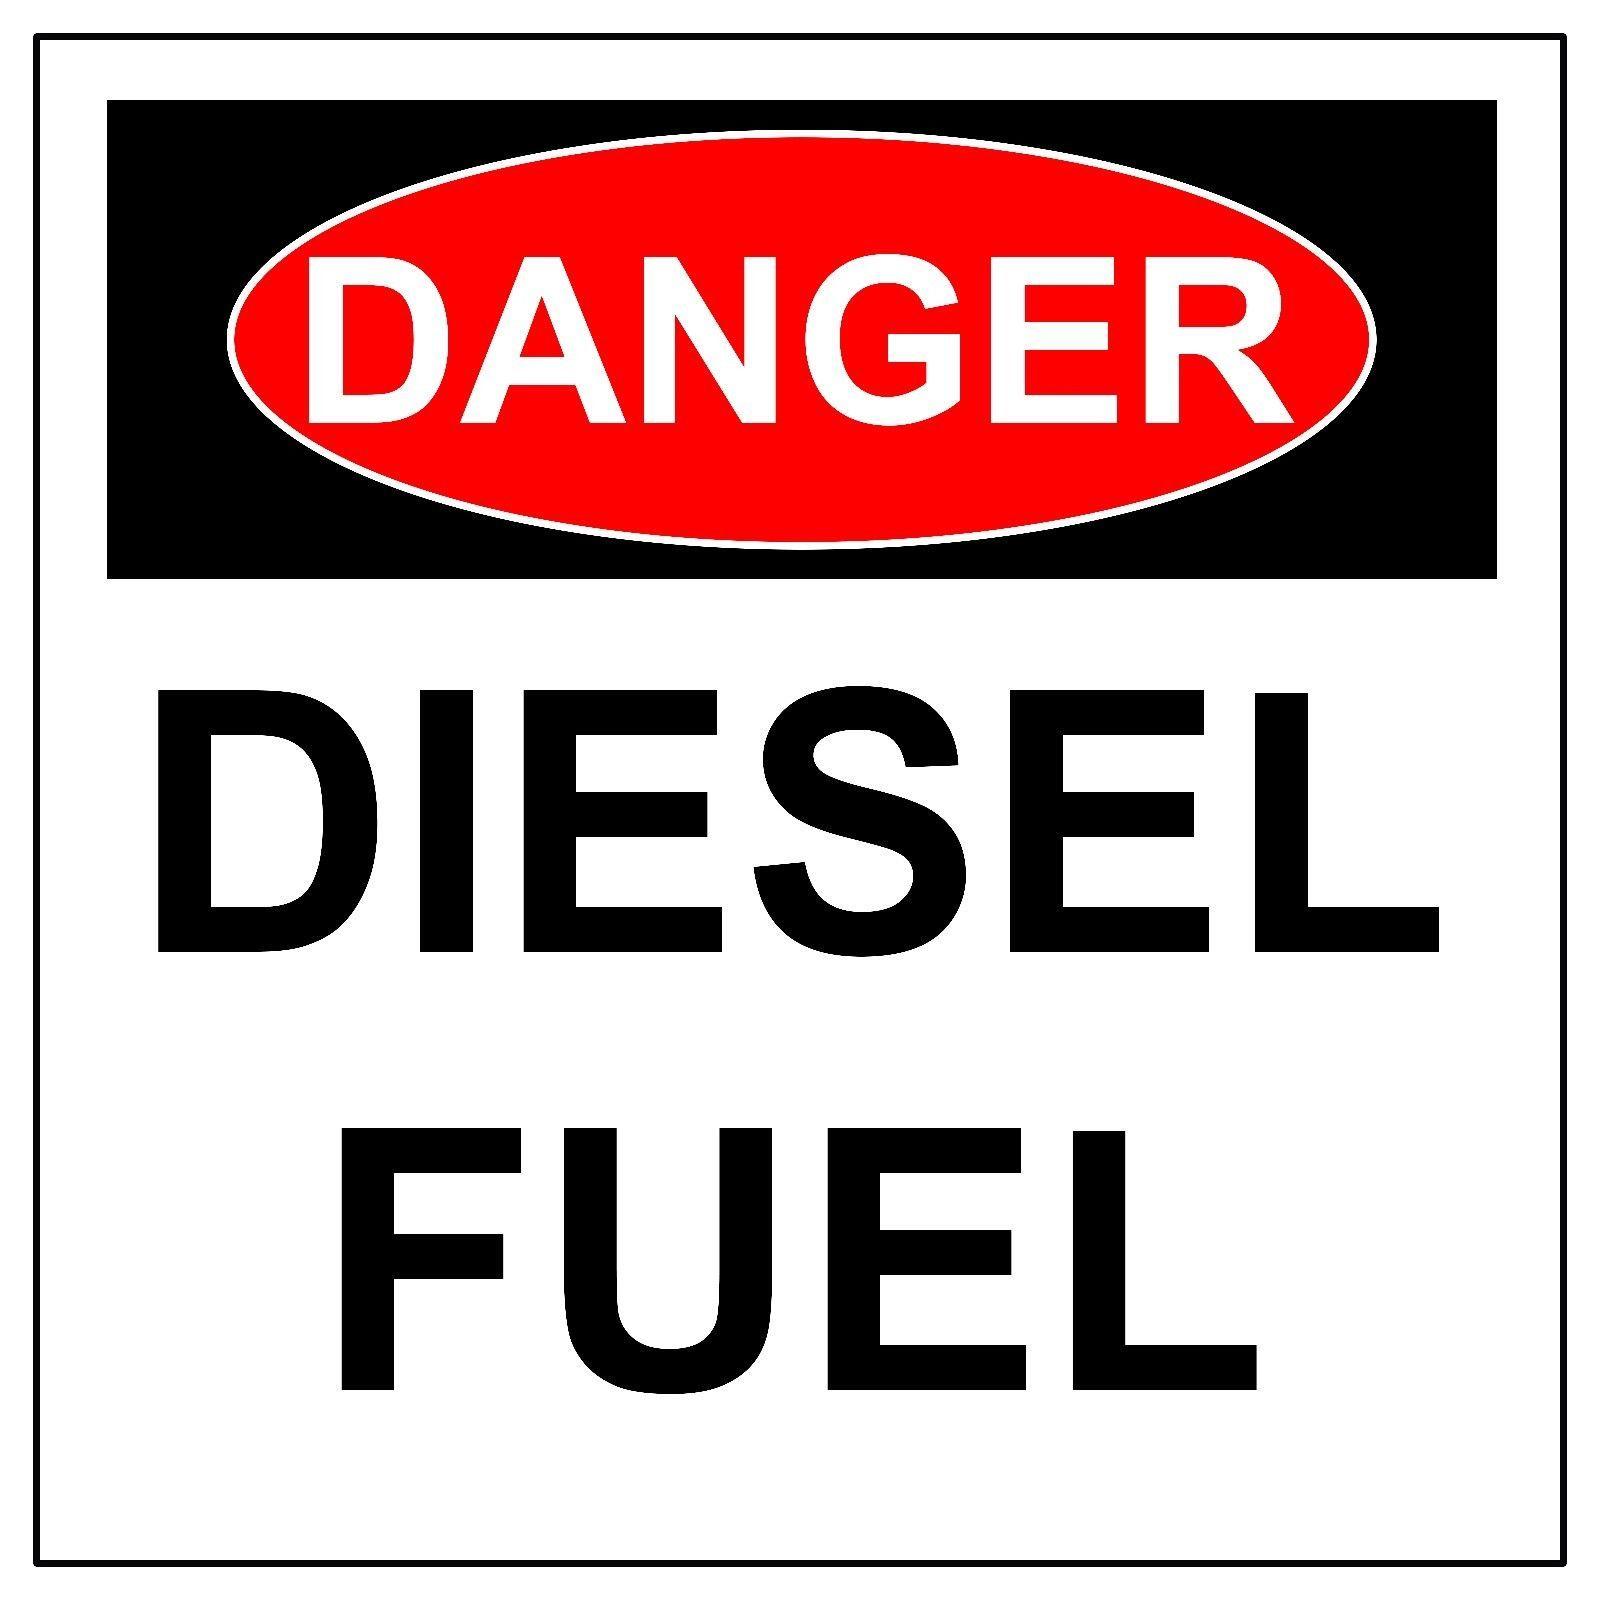 Danger Diesel Fuel Sign, Aluminum Hazard Metal Safety Warning UV Signs